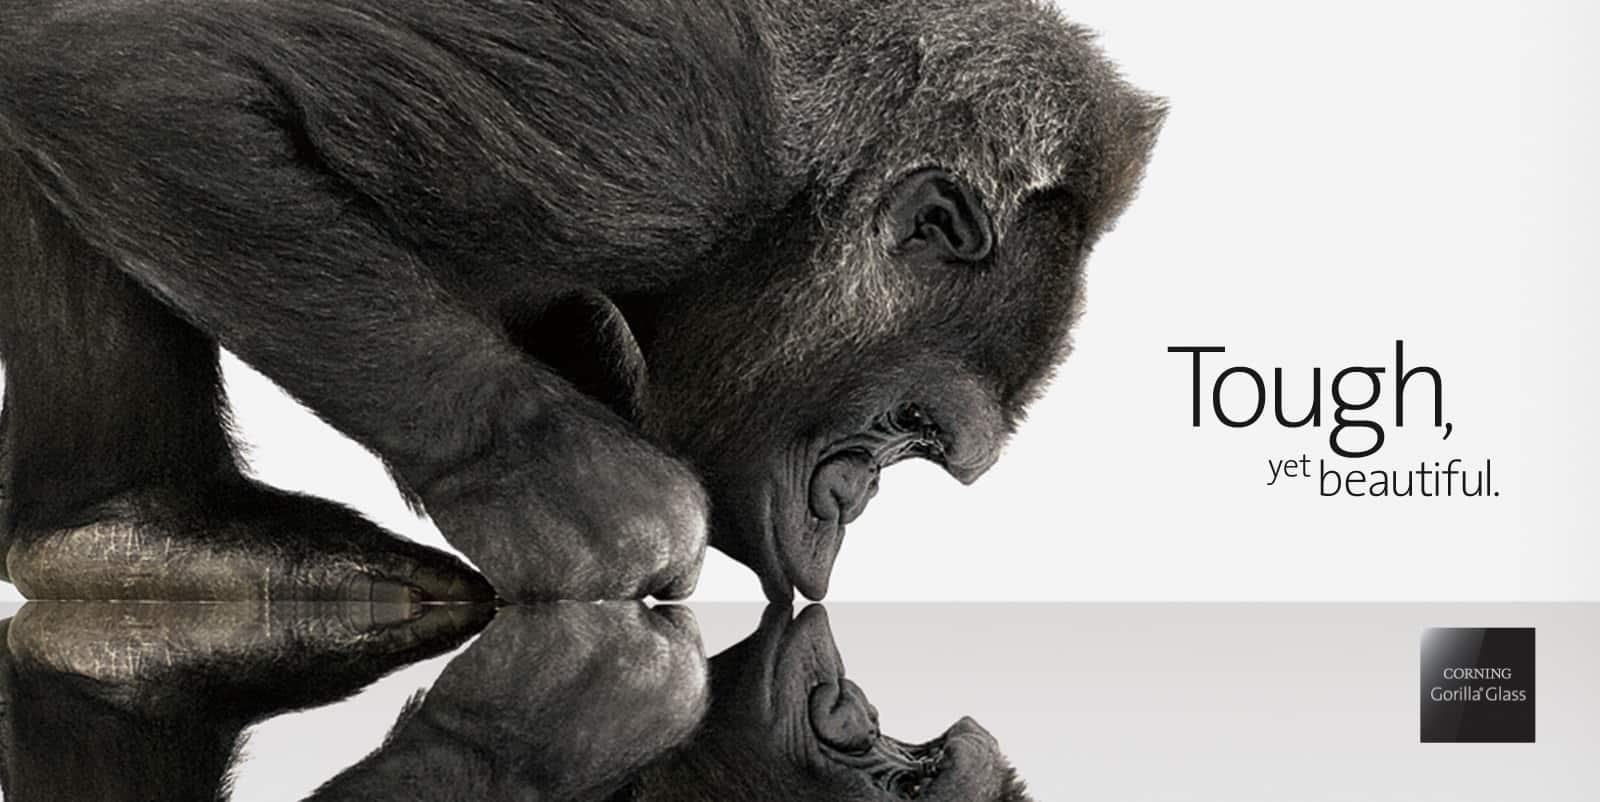 Gorilla Glass maker uses secret codeword to protect Apple's identity